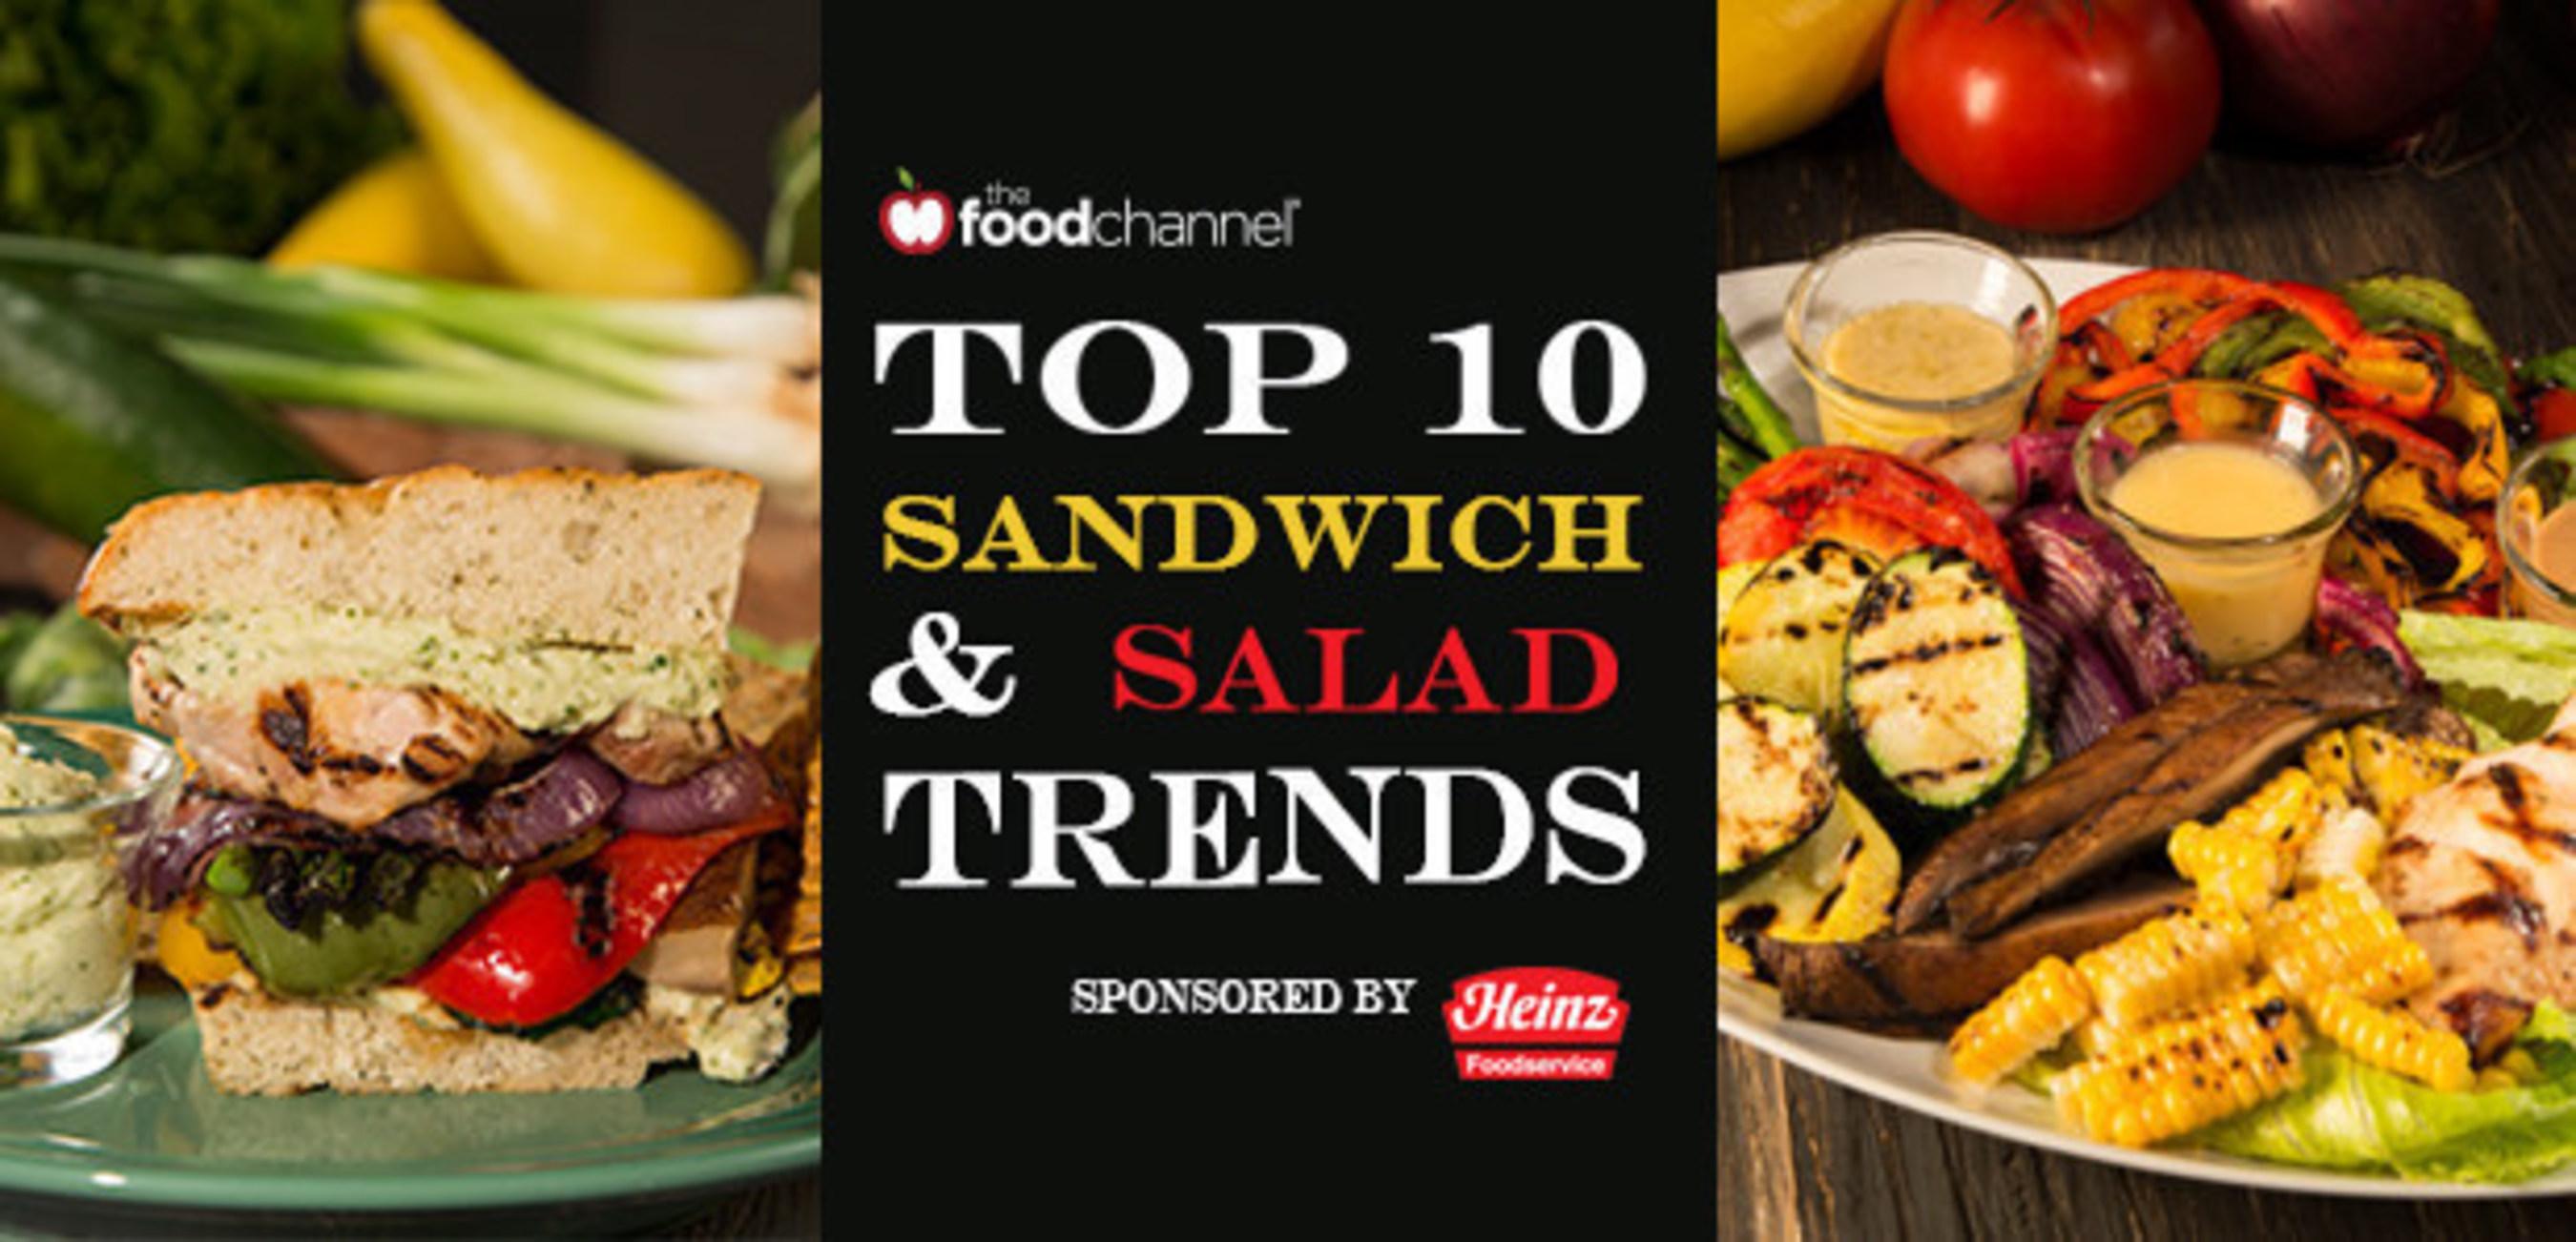 FoodChannel.com Top 10 Sandwich & Salad Trends